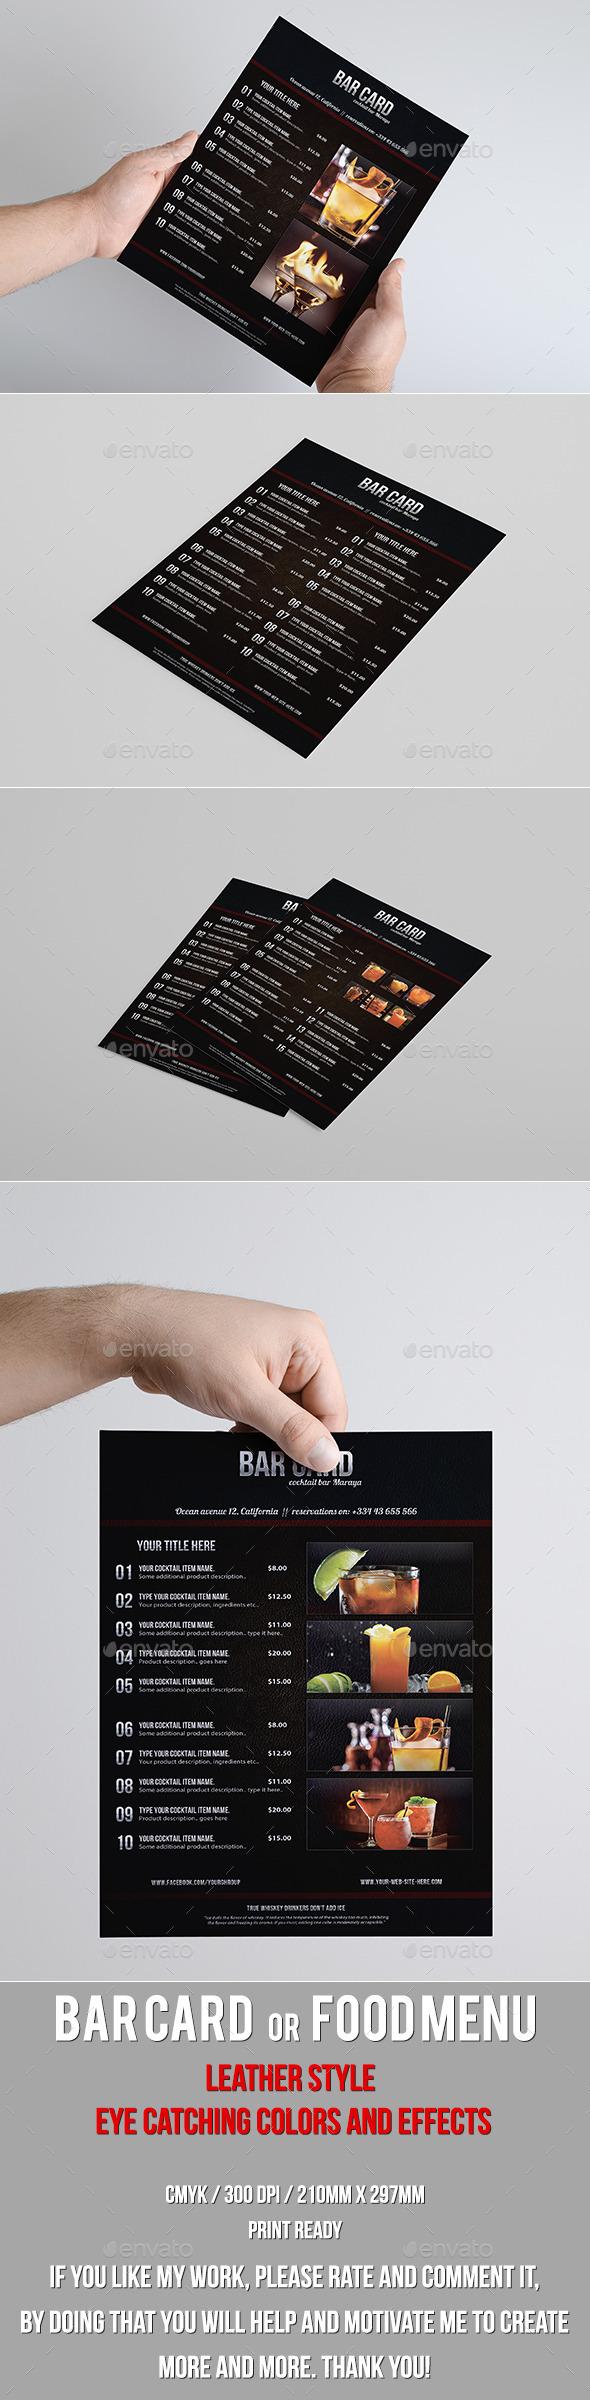 Leather Style Bar Card or Food Menu - Food Menus Print Templates